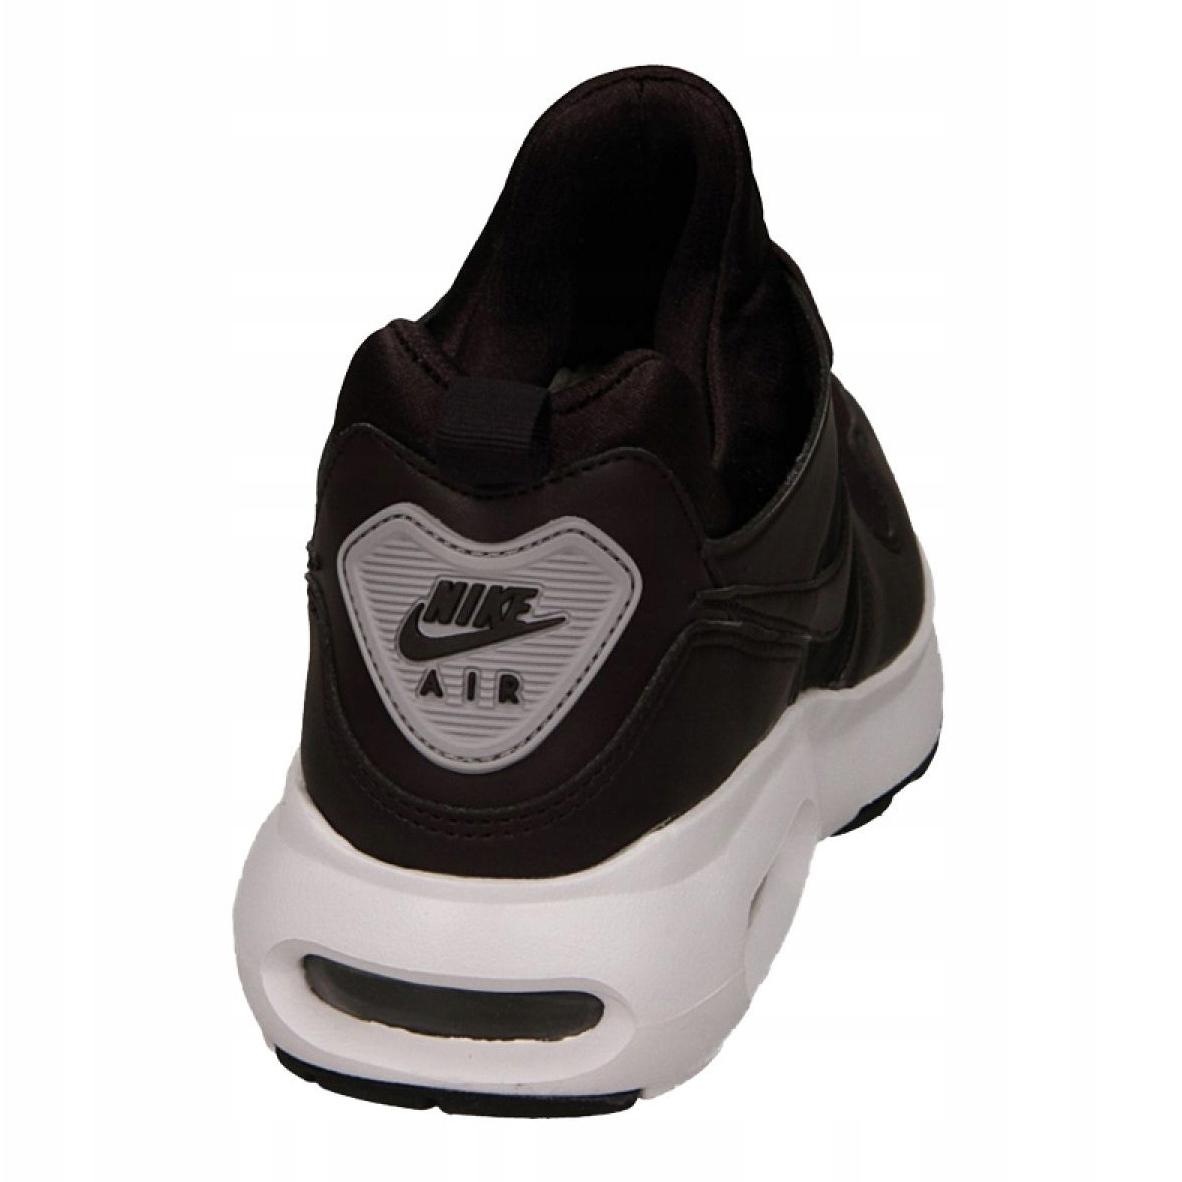 Nike Air Max Prime Sl M 876069 600 skor röd